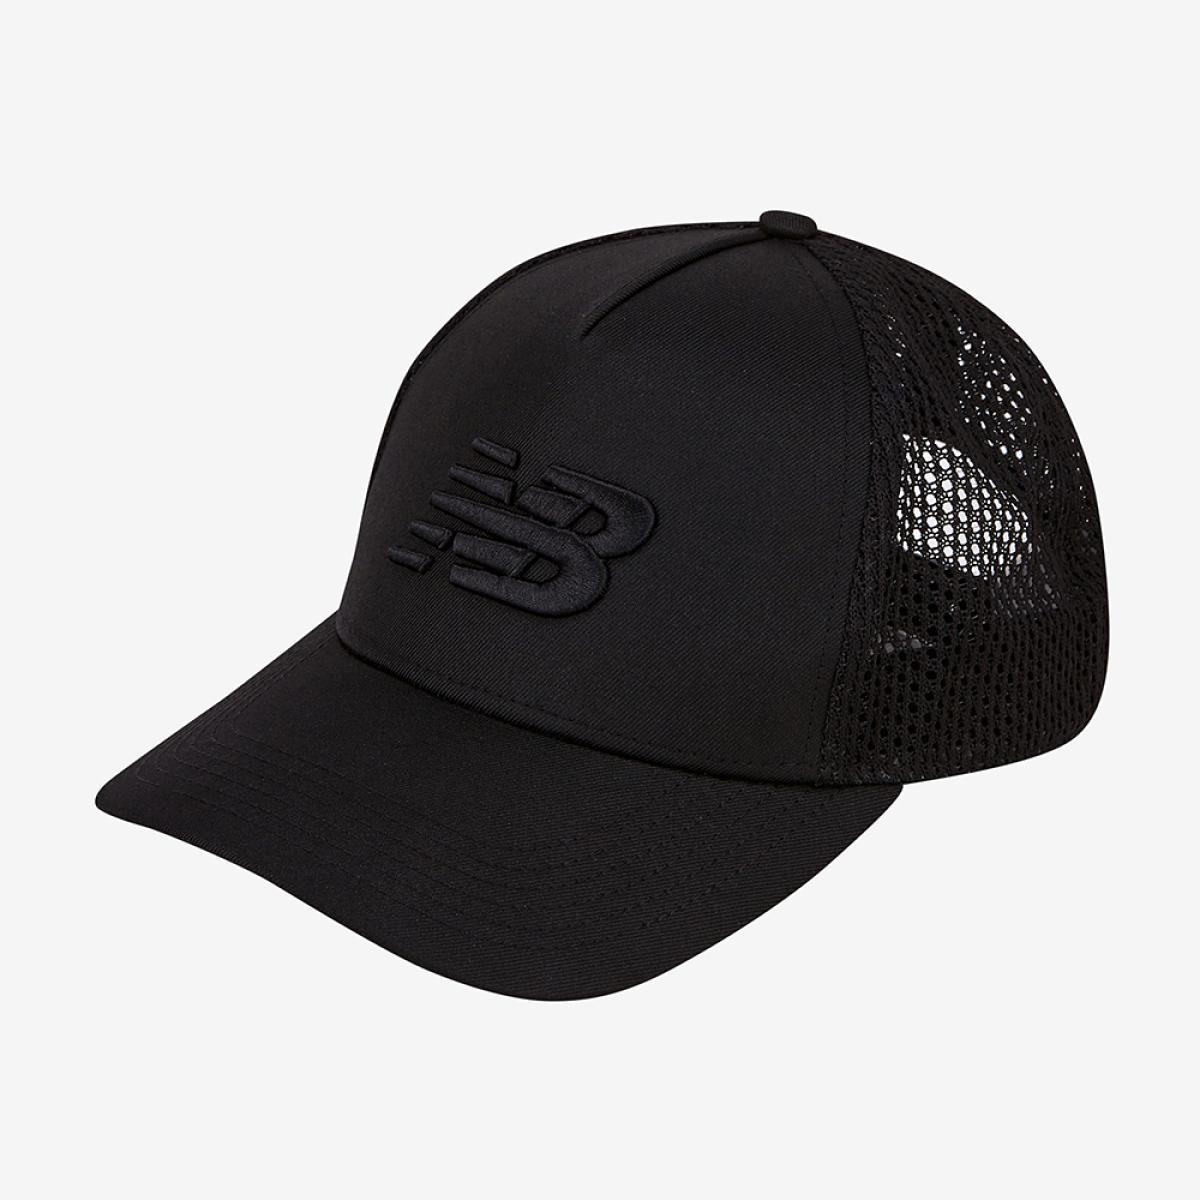 TEAM TRUCKER CAP